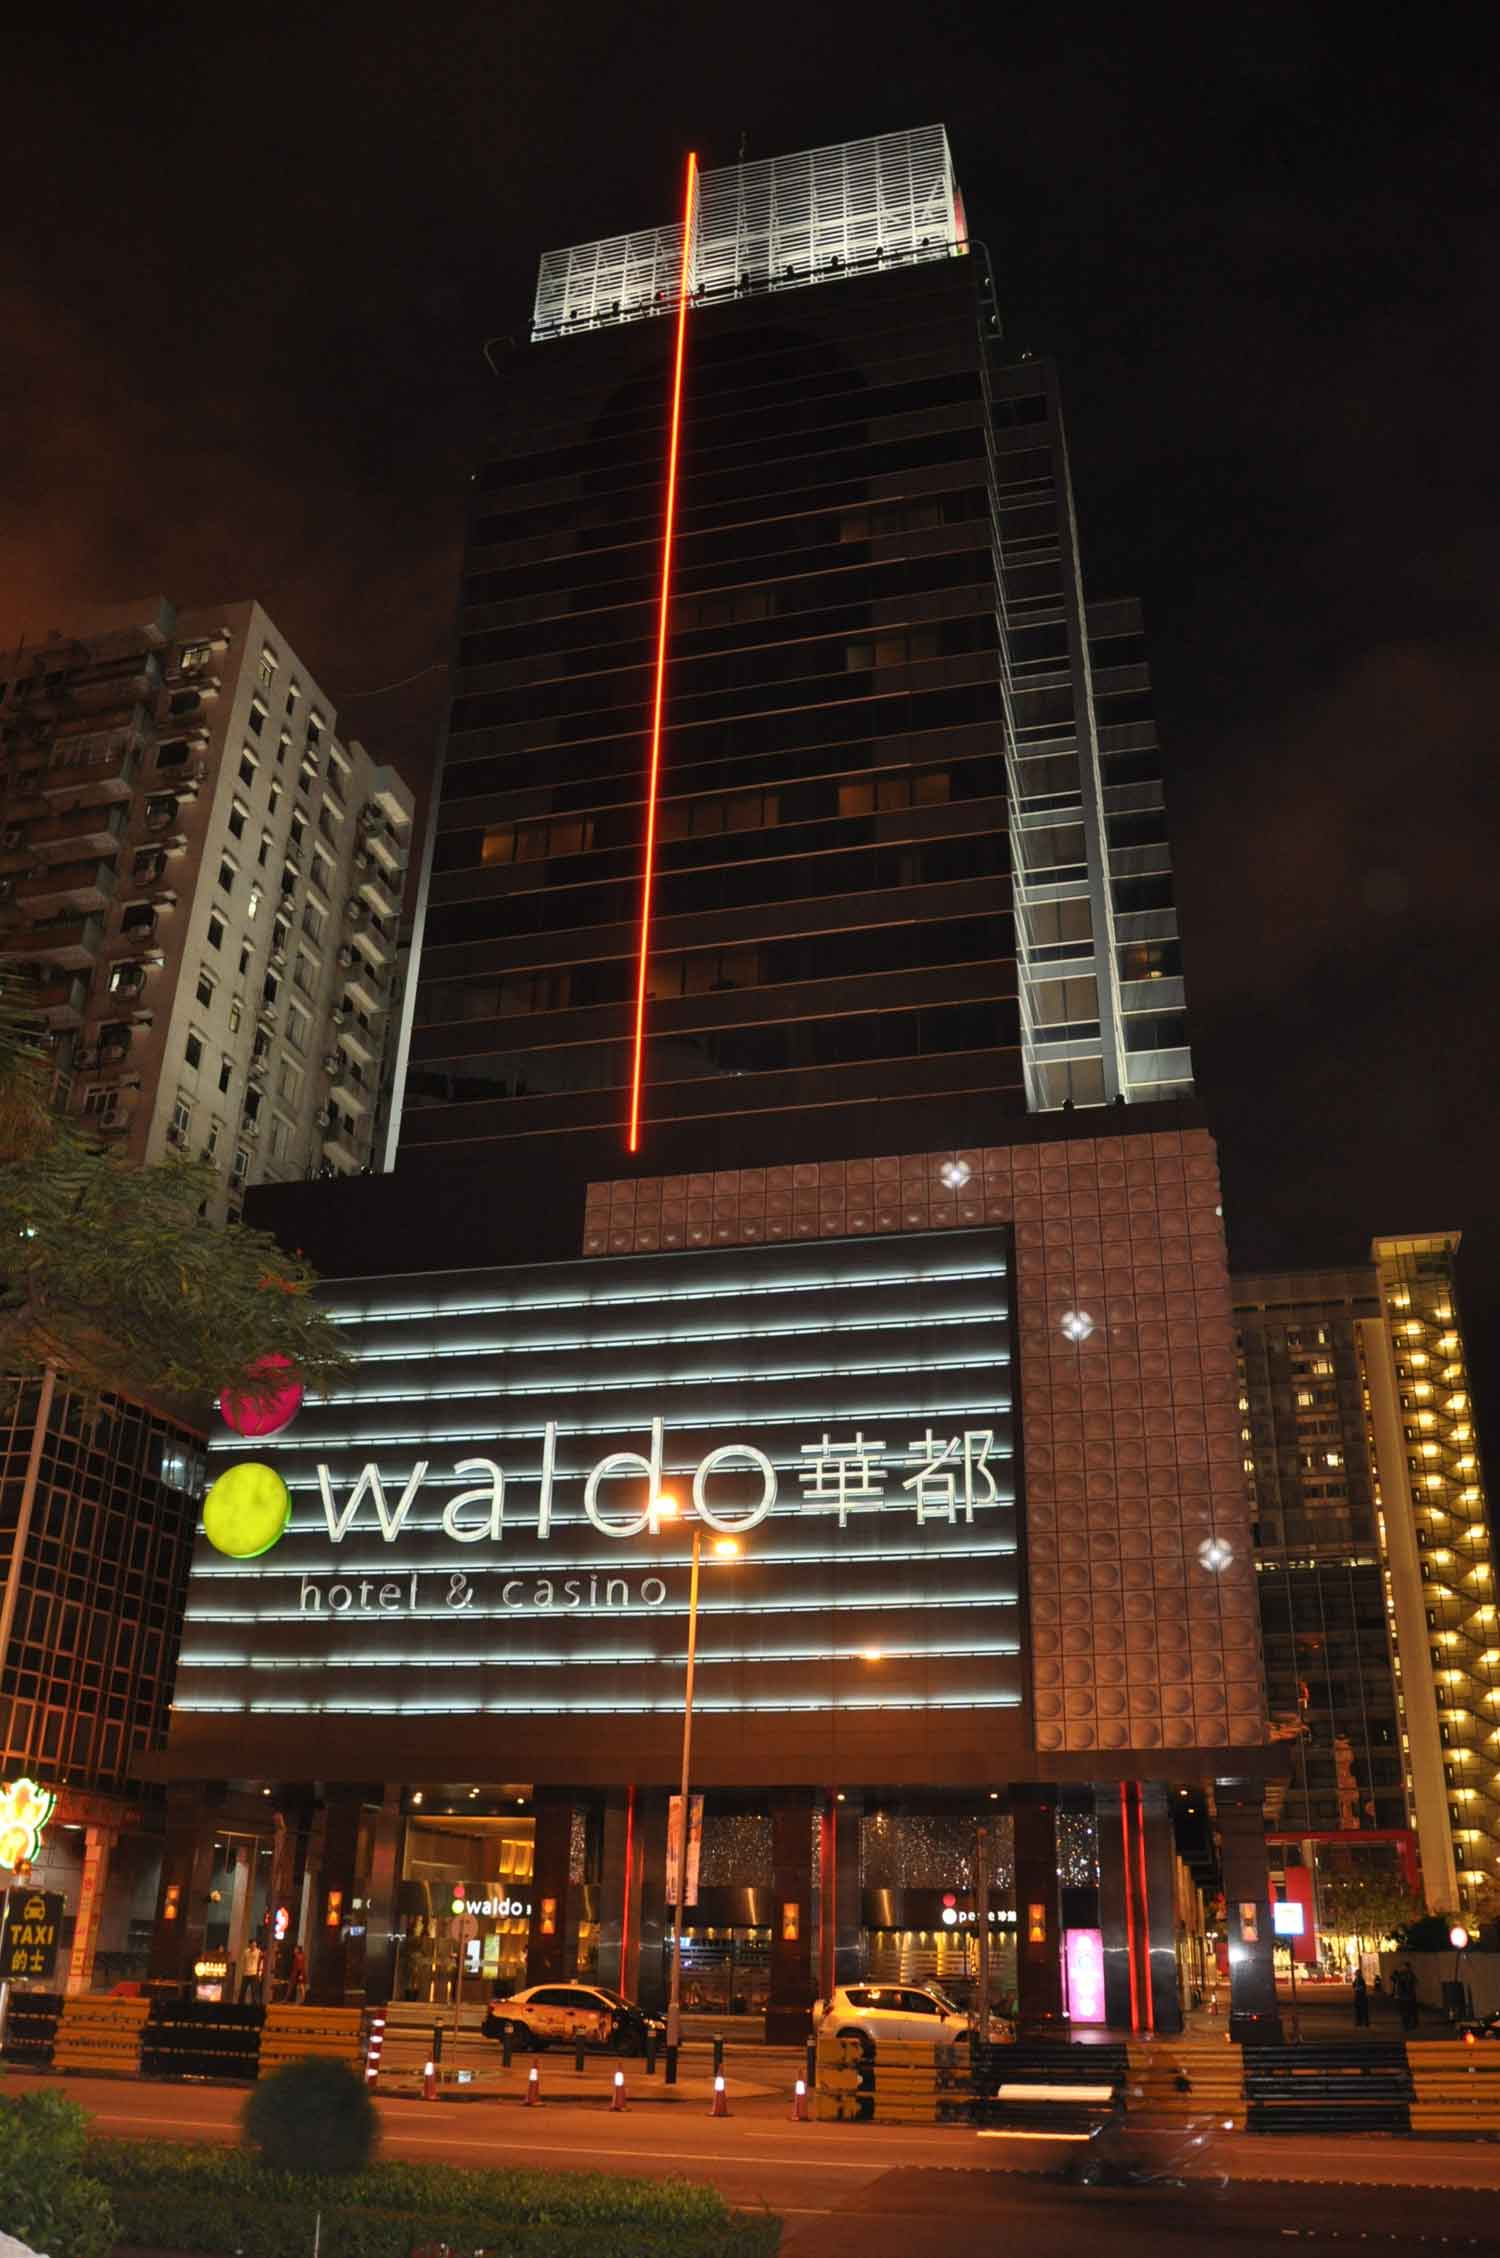 Waldo Hotel Macau at night